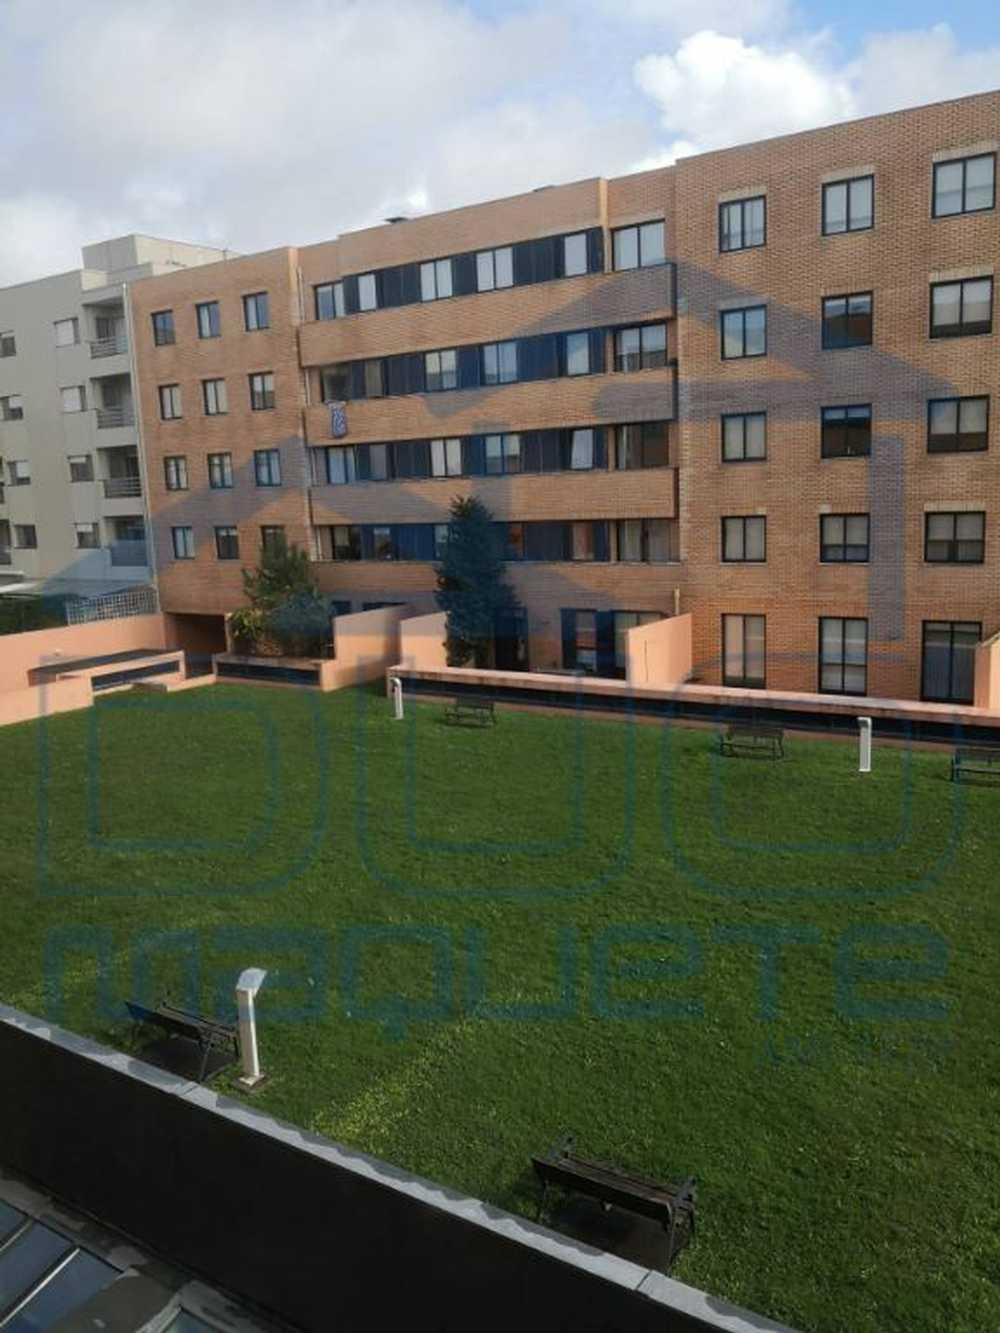 Matosinhos Matosinhos Apartment Bild 108685